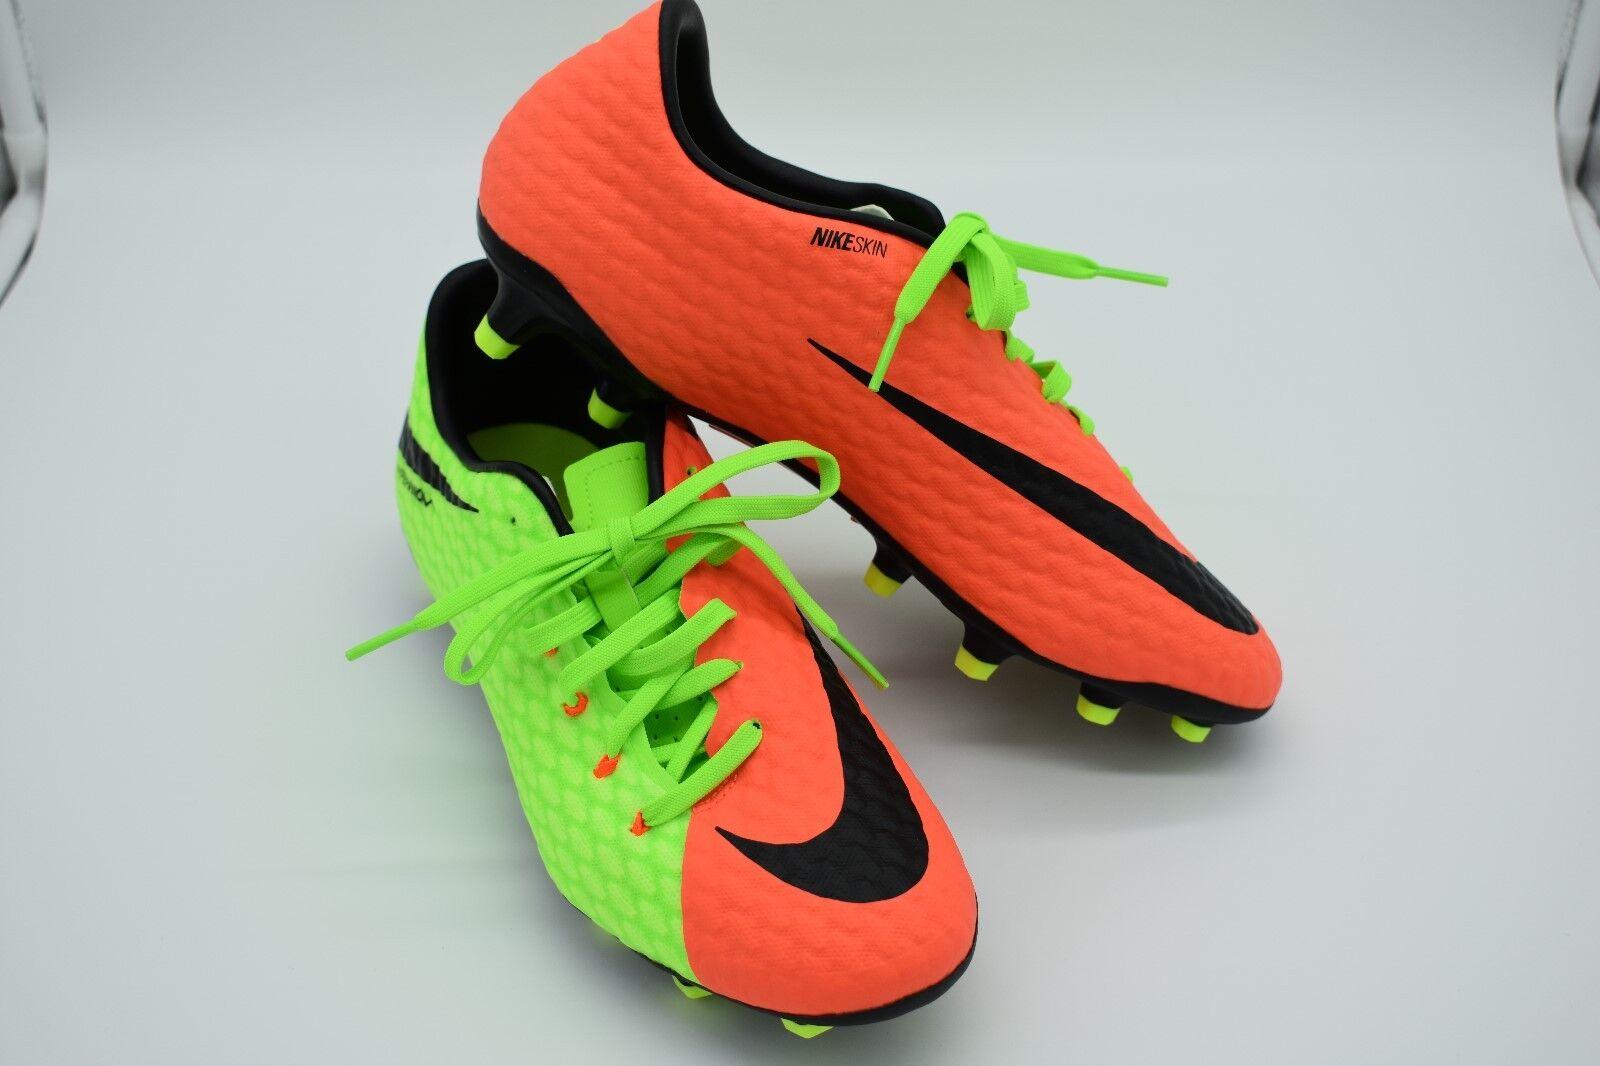 cf8c62d75 Nike Hypervenom Phelon III FG Shoes Football BOOTS Trainers 852556 ...